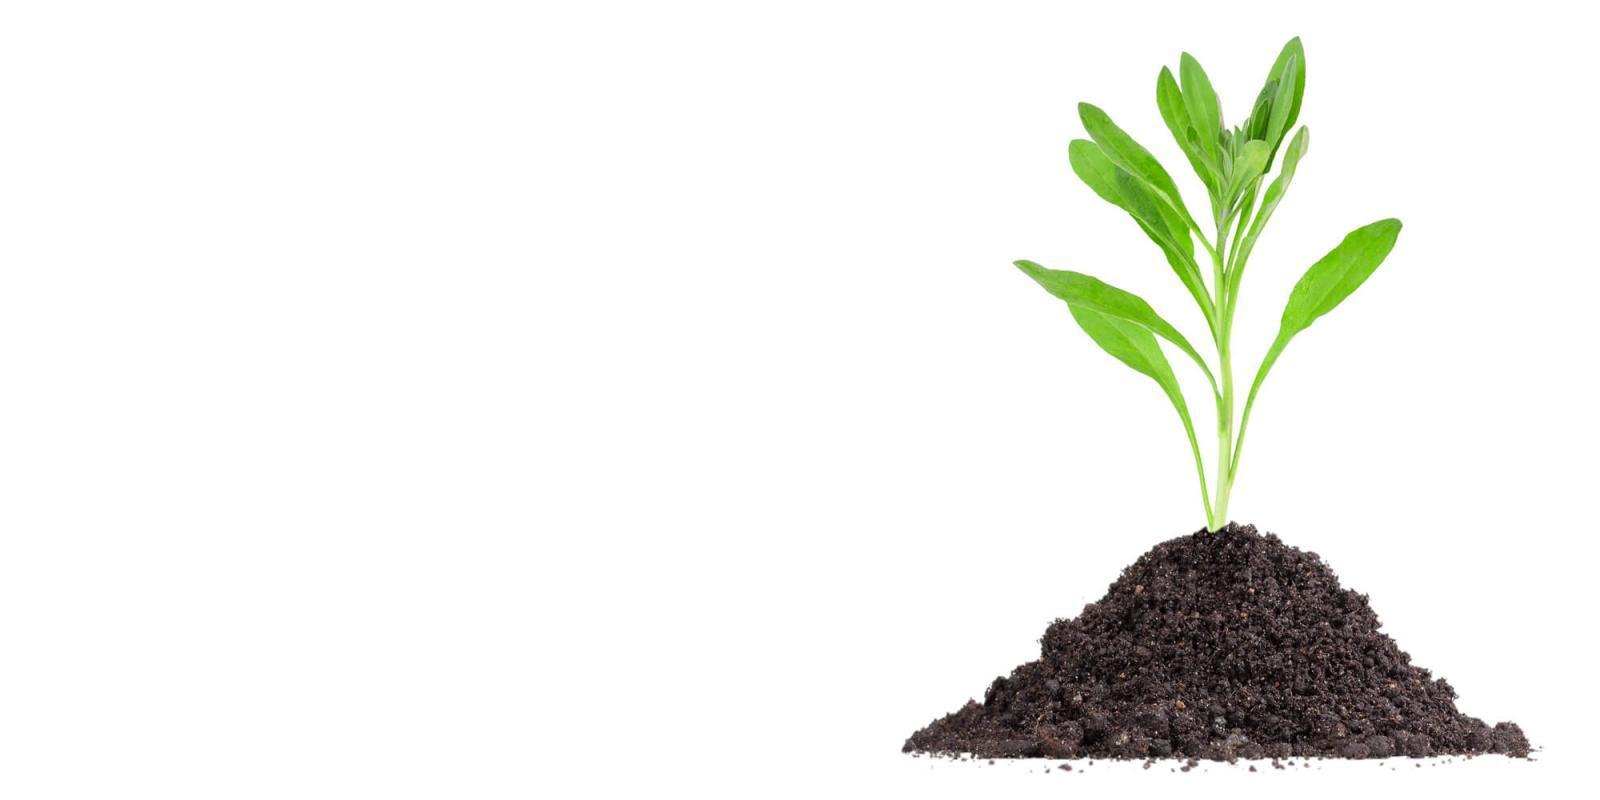 Healthy soils produce thriving plants